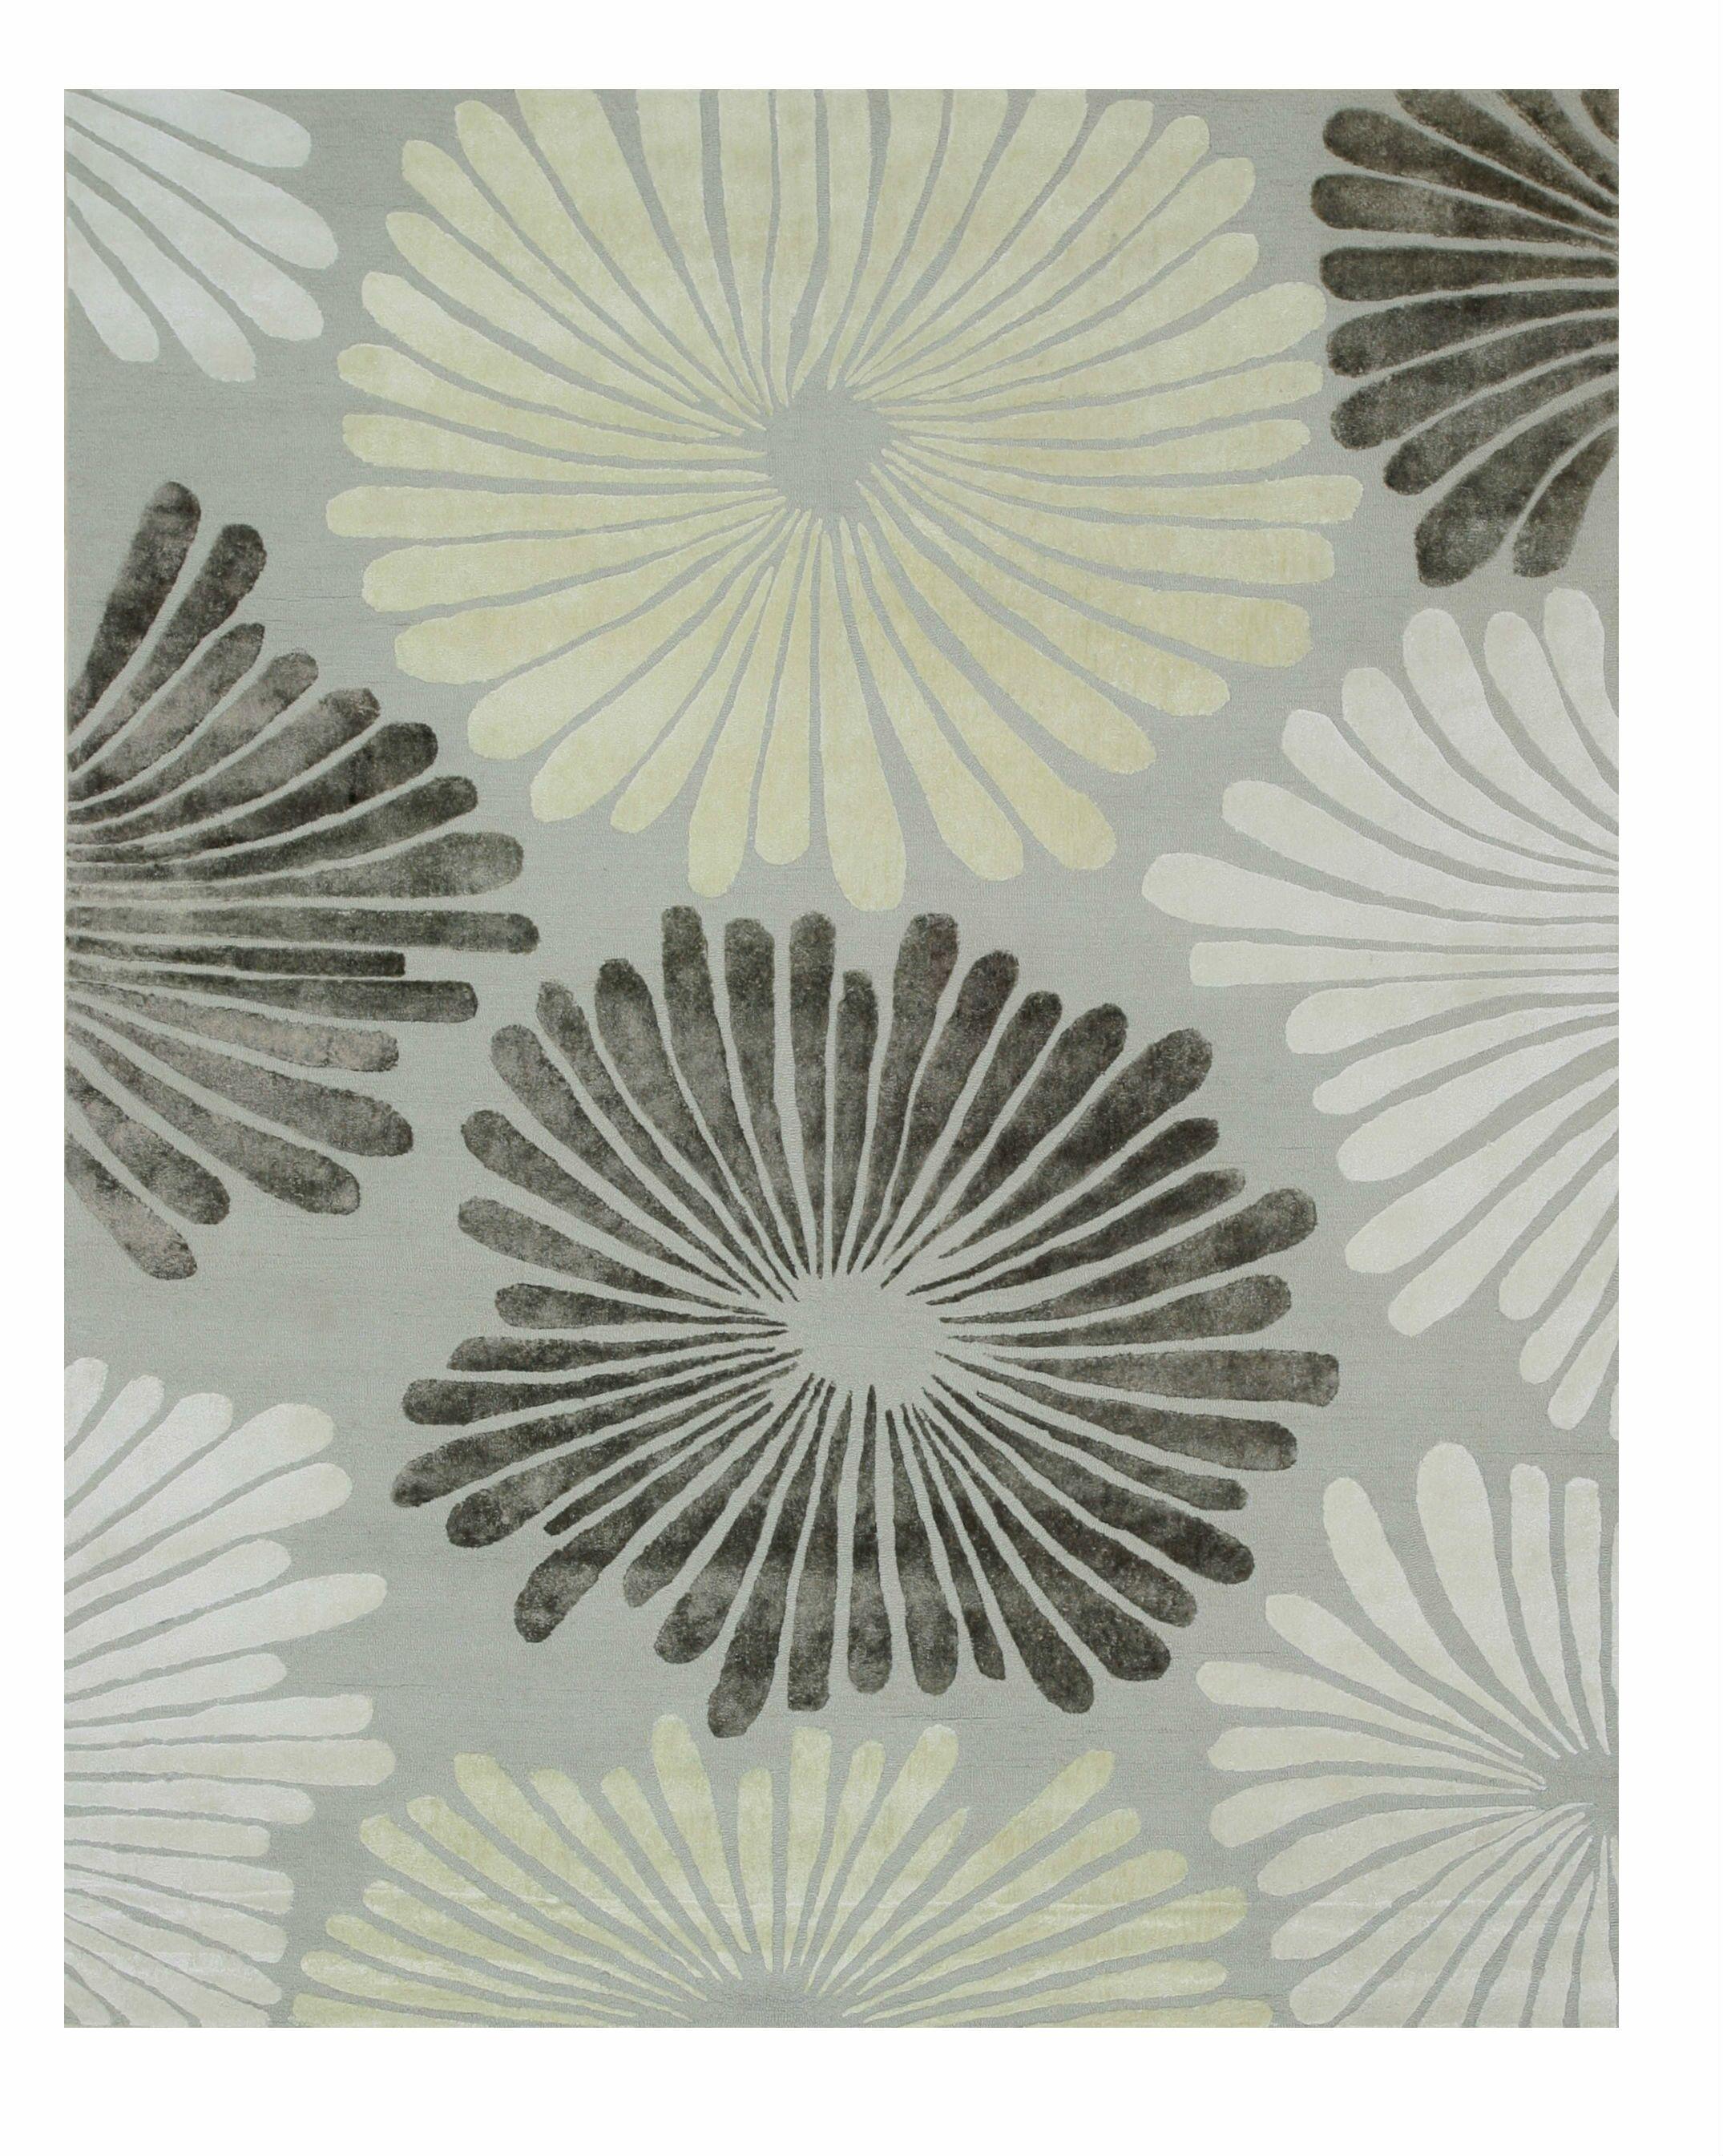 Sunflower Hand-Tufted Gray Area Rug Rug Size: 9' x 12'